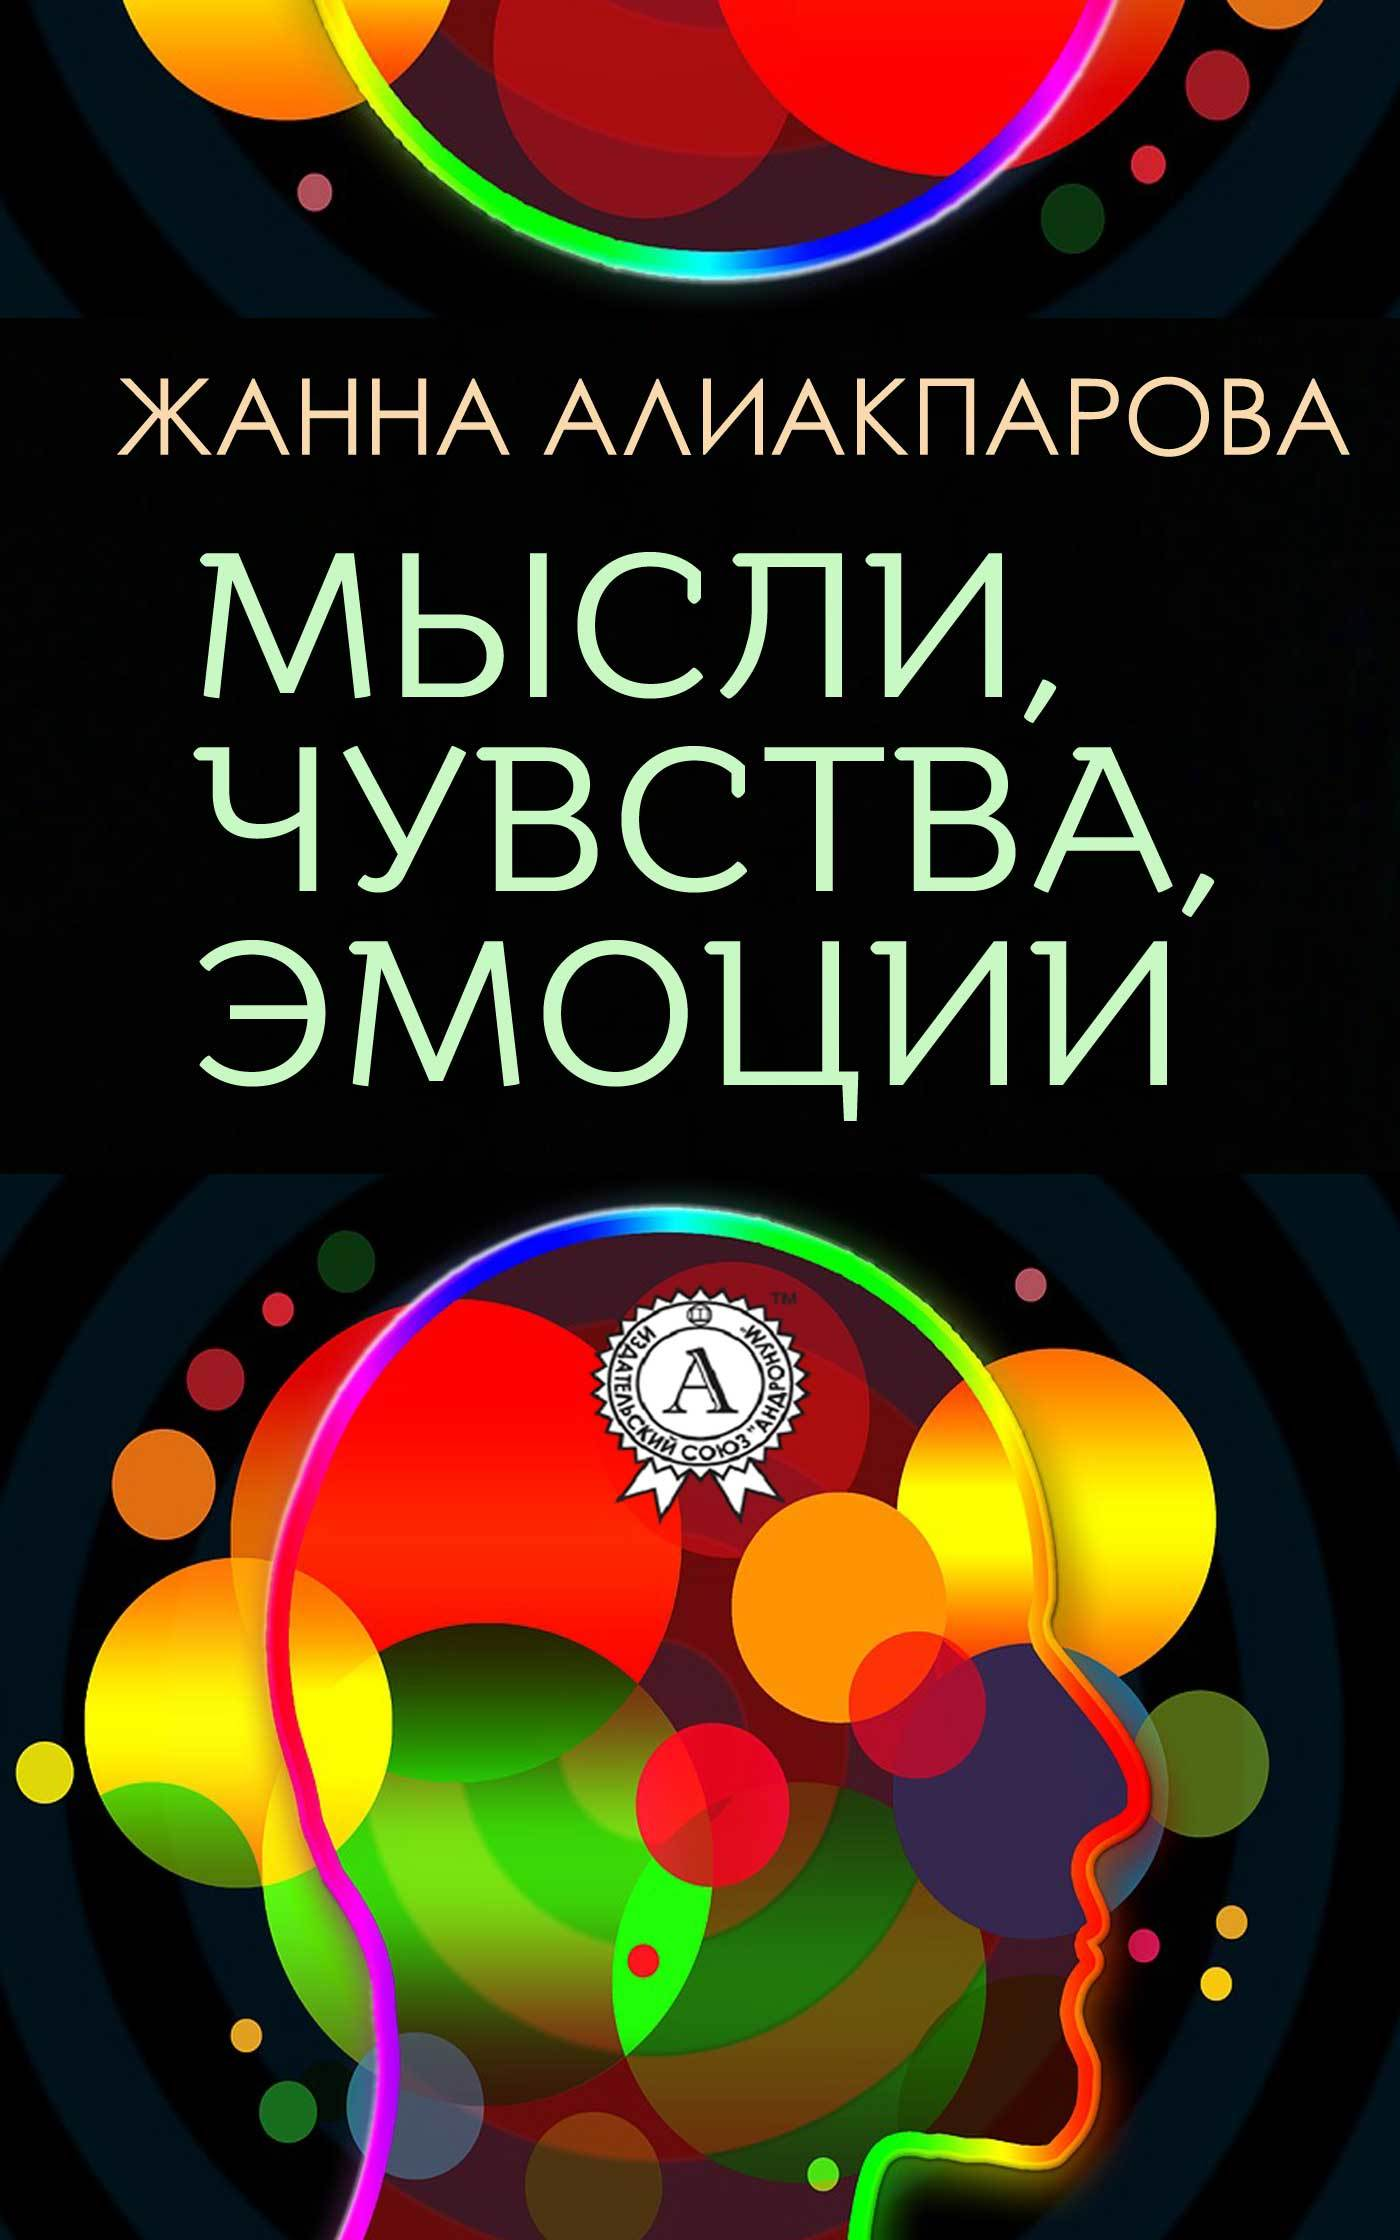 Жанна Алиакпарова - Мысли, чувства, эмоции